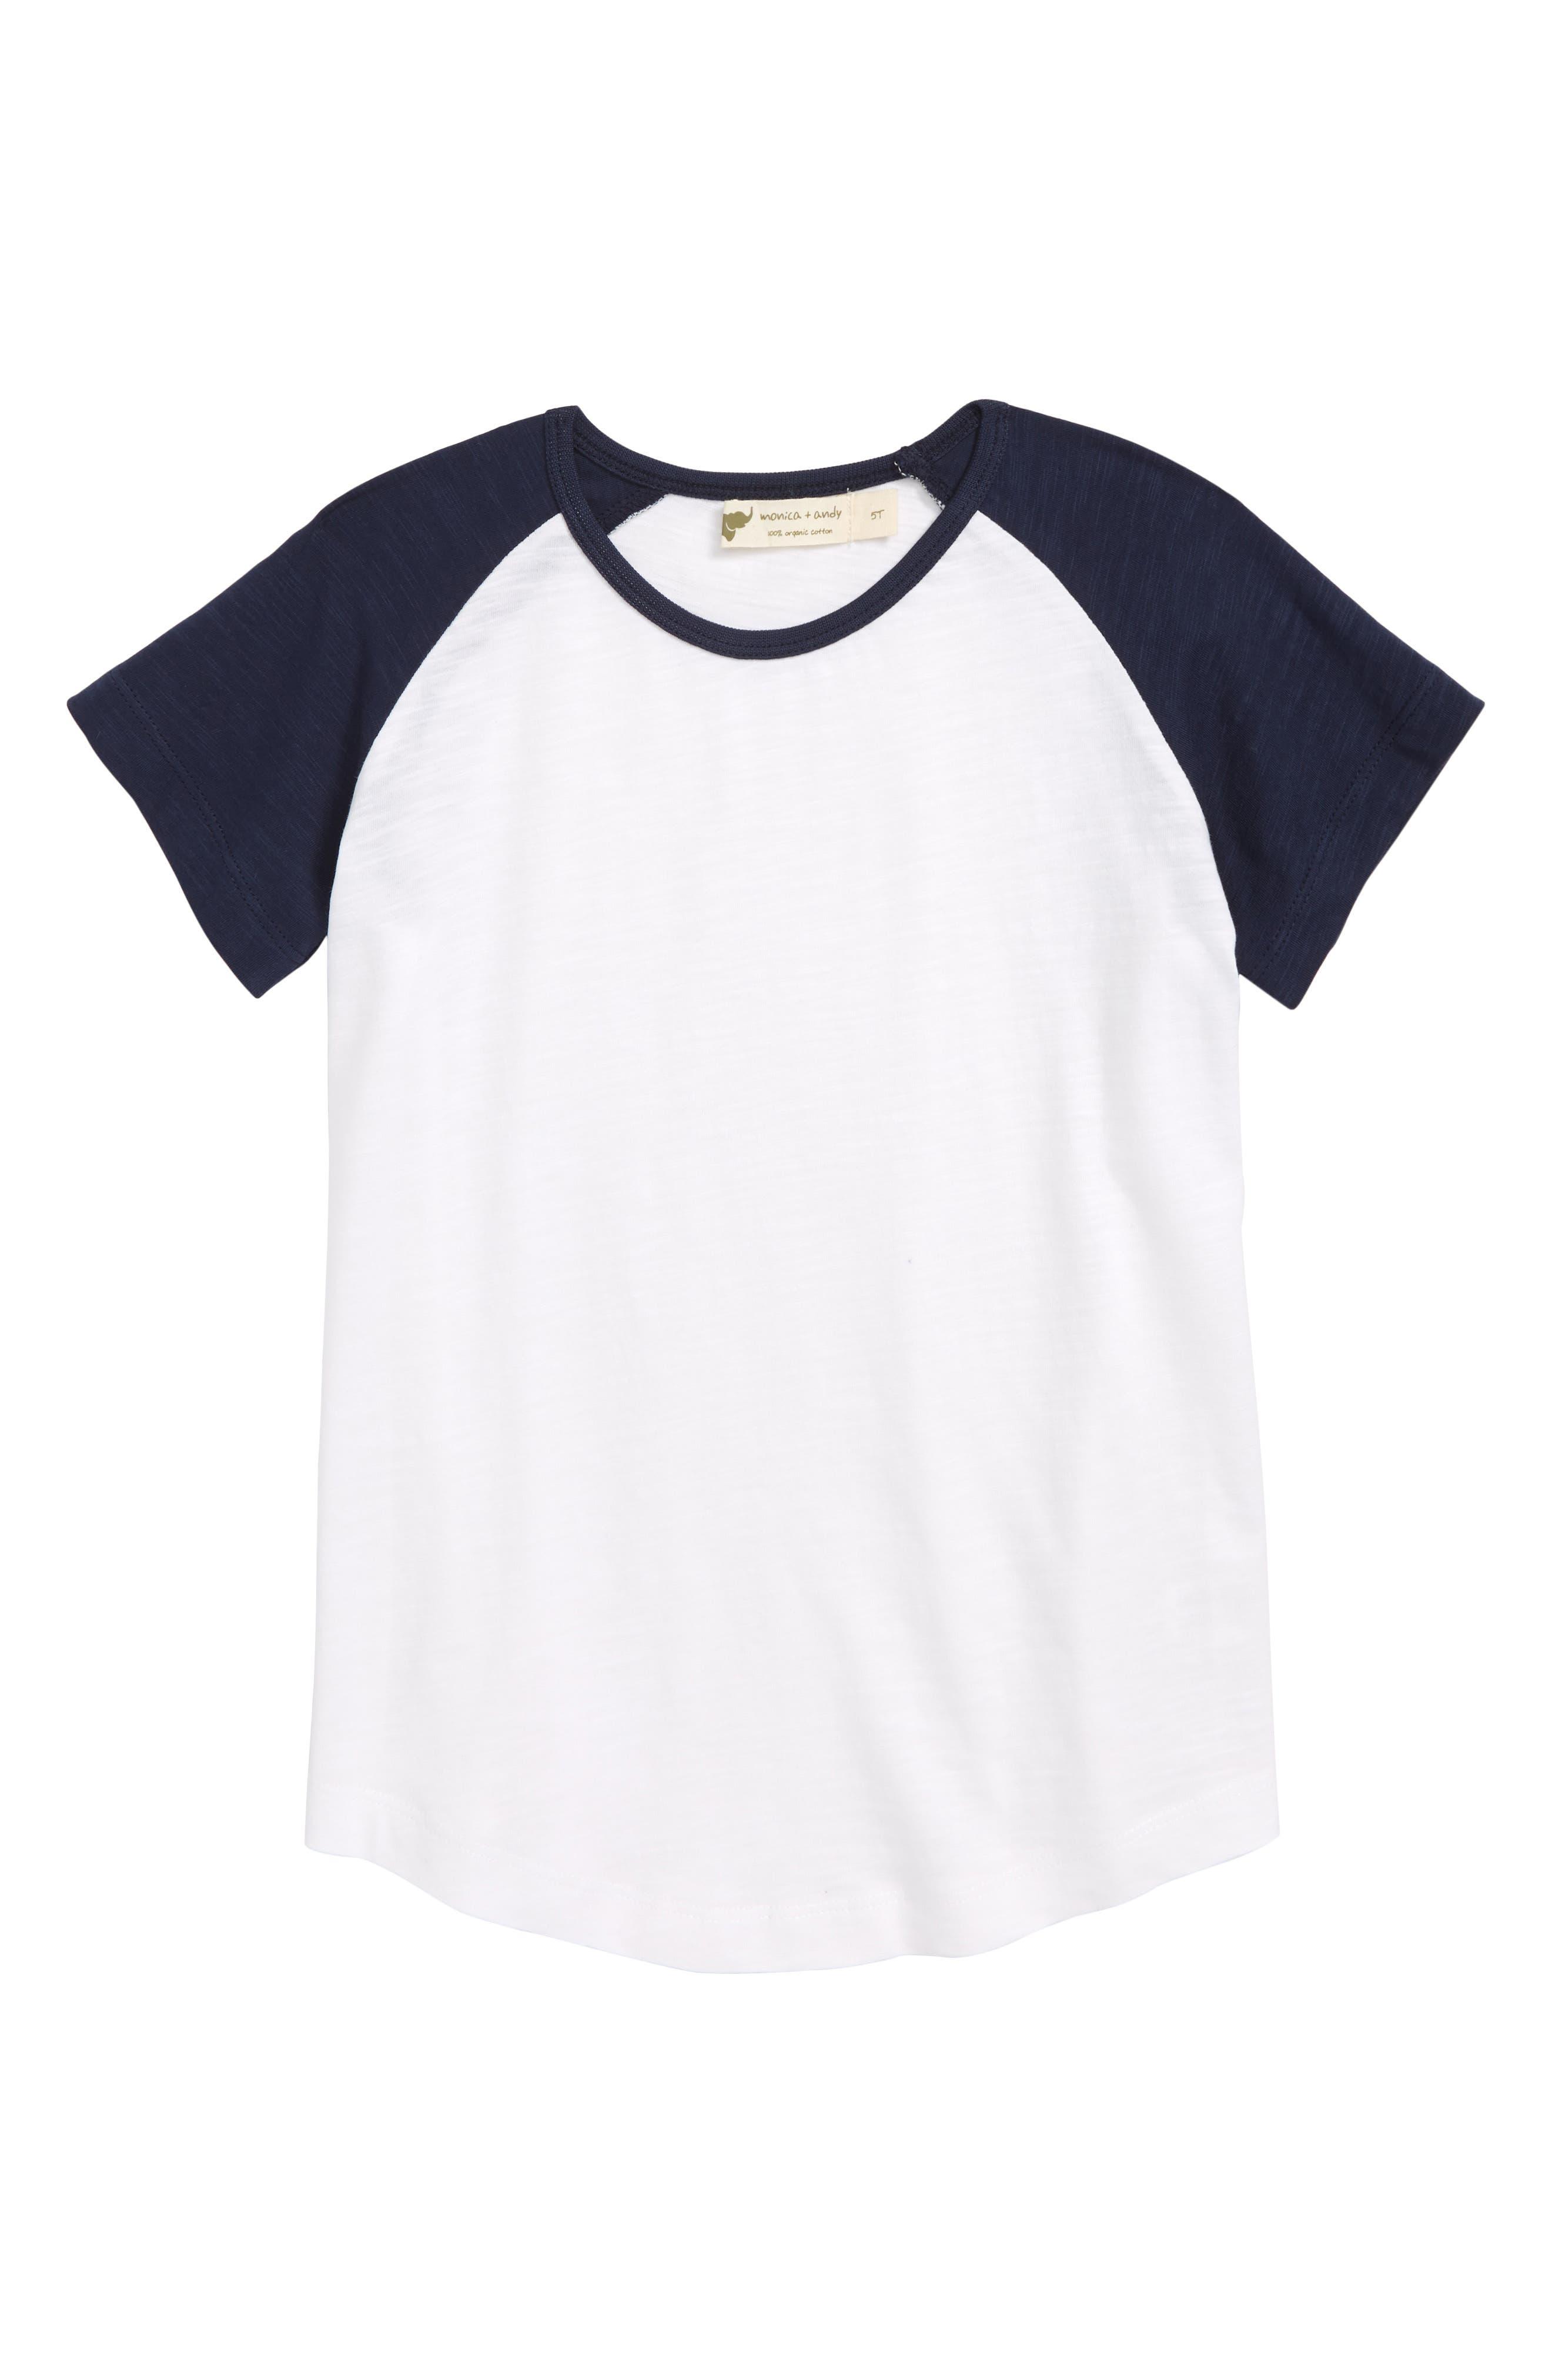 Little Slugger Organic Cotton T-Shirt,                         Main,                         color, Navy/ White